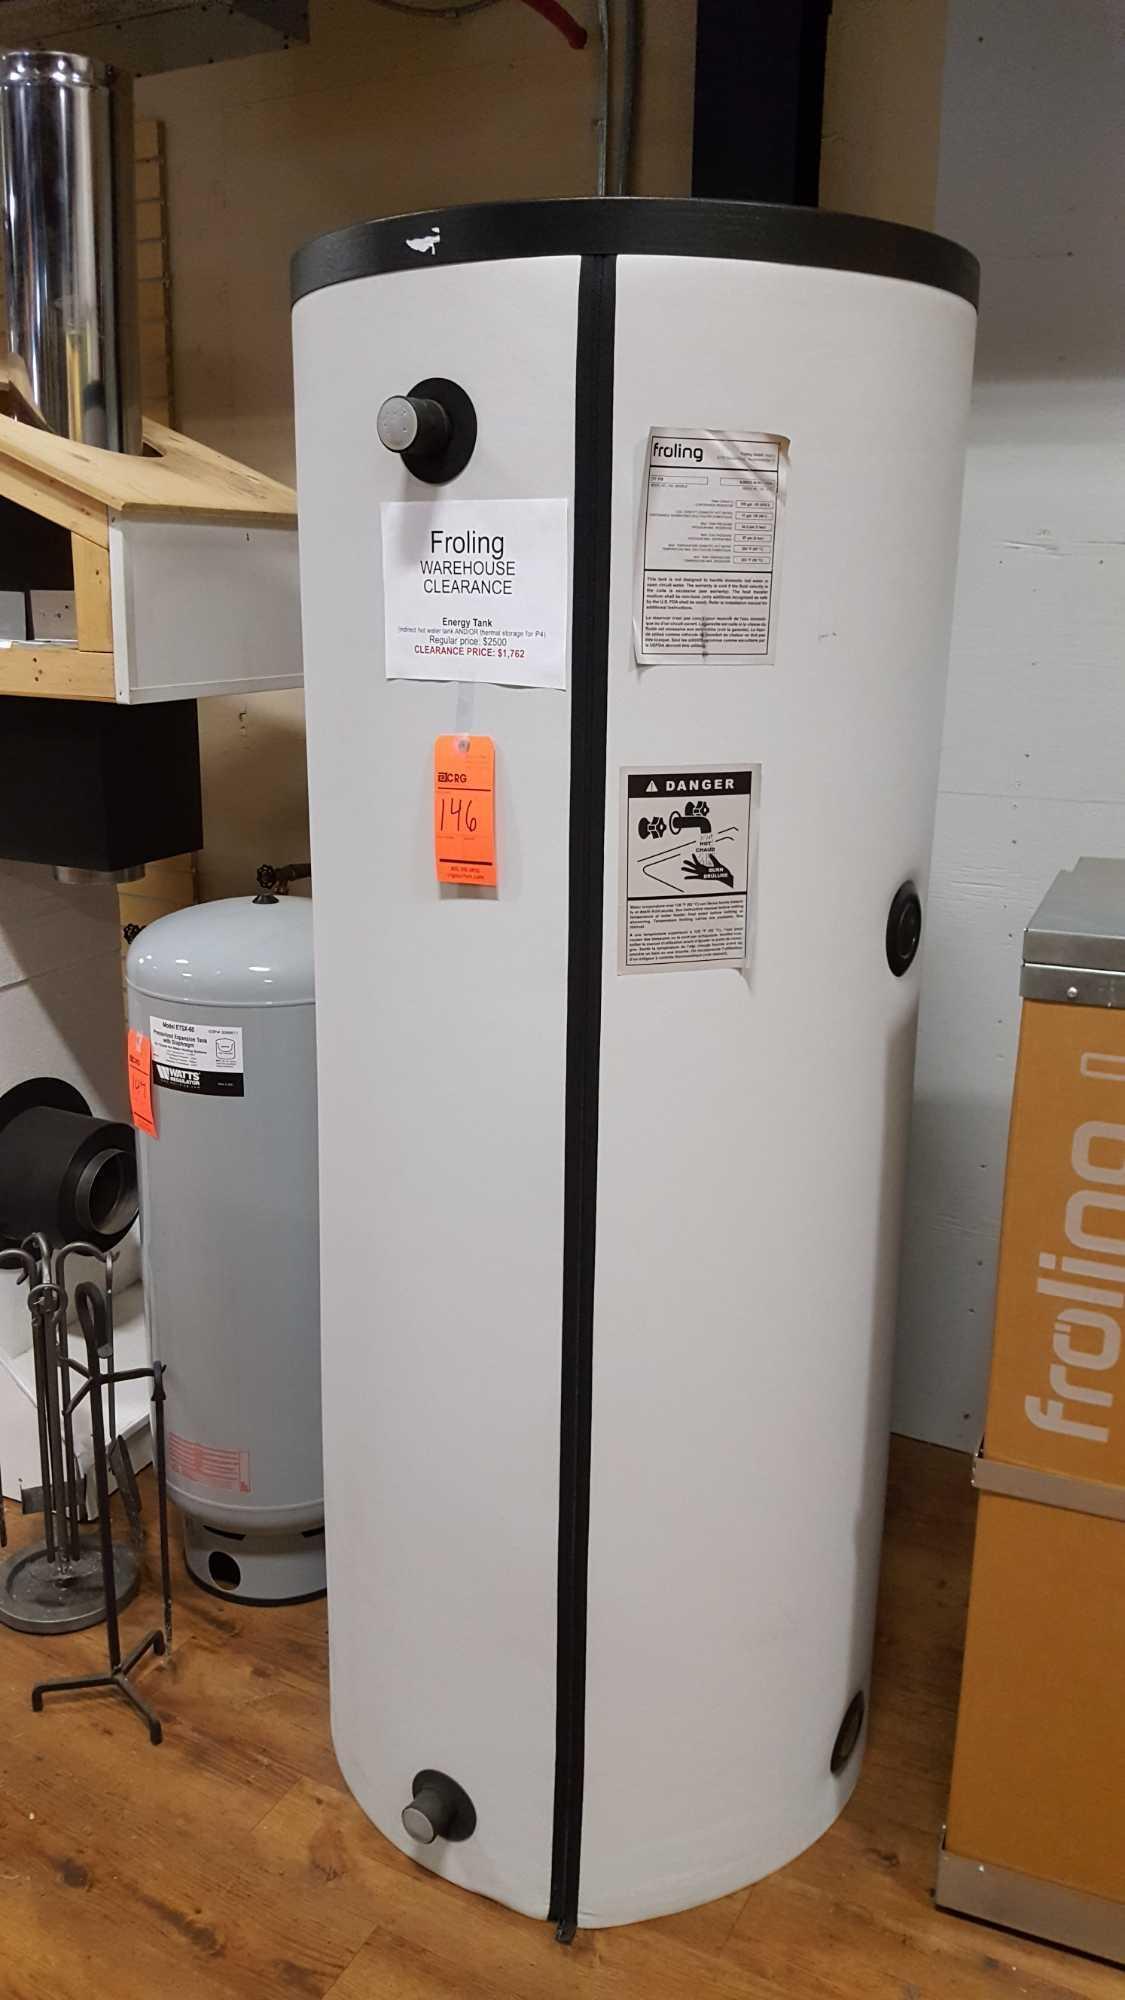 Is pellet boiler dangerous? 16